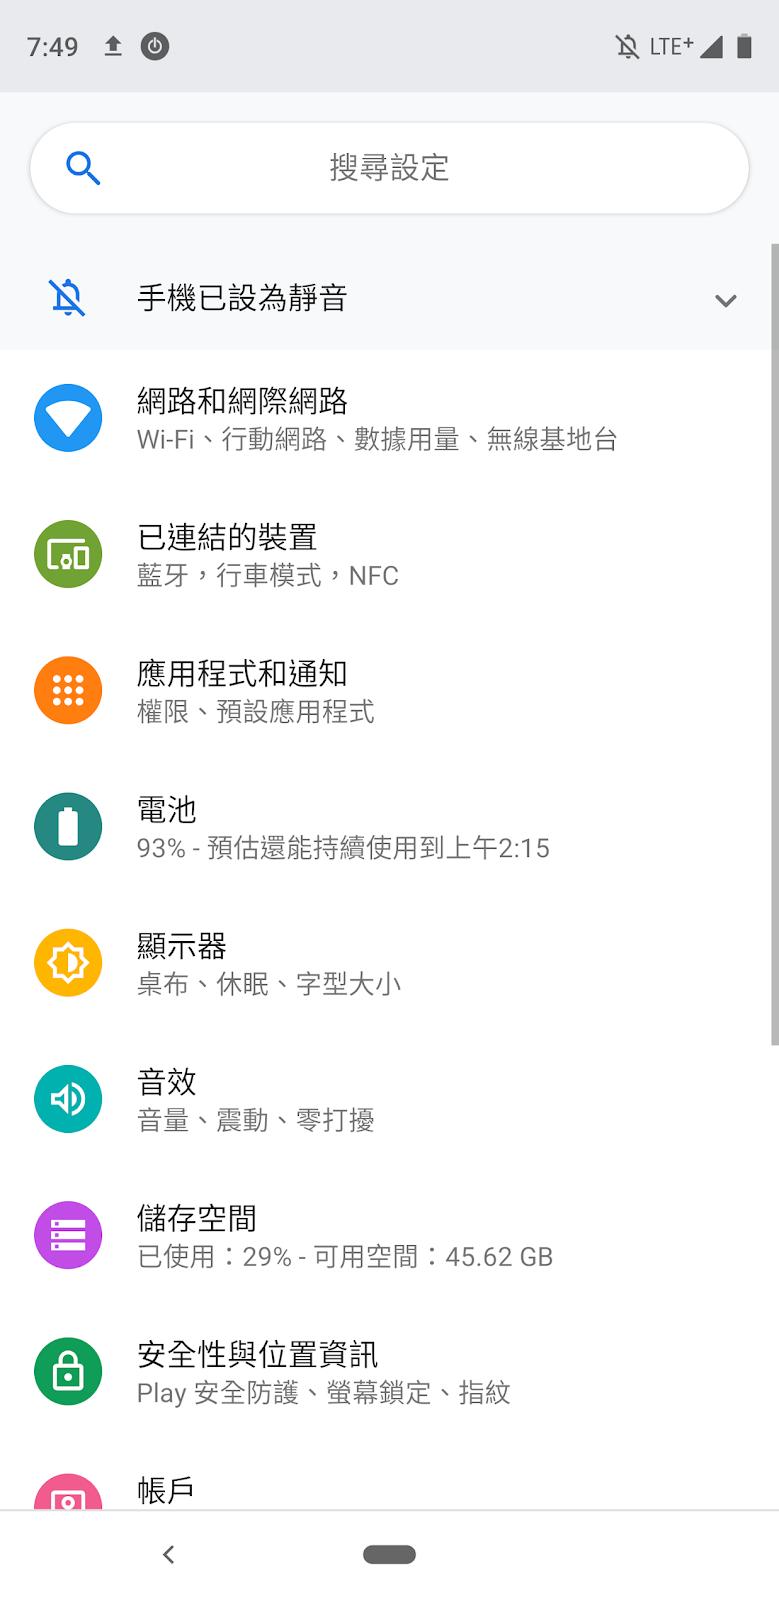 Android Auto 手機當車載導航實測,搭配中文語音Google 助理開車應用